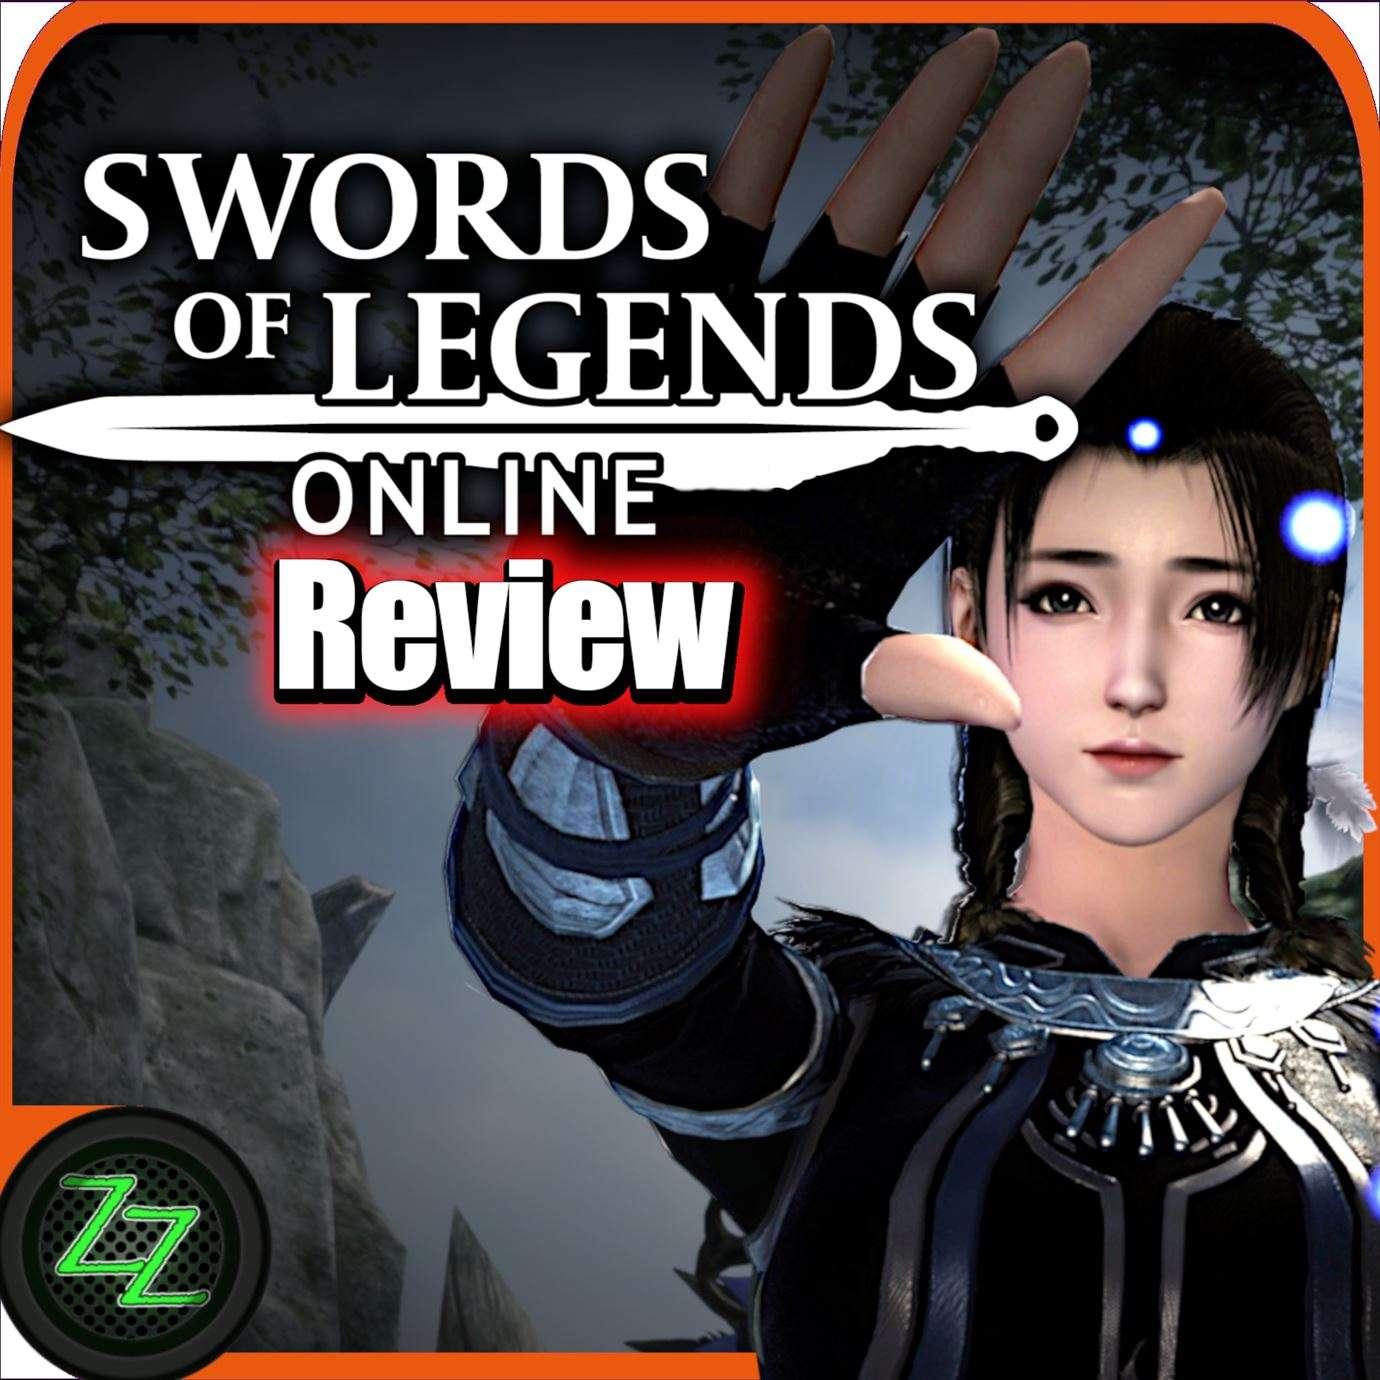 Swords Of Legends Online Review – Superschickes Asia MMORPG im Test (Deutsch) by zapzockt.de